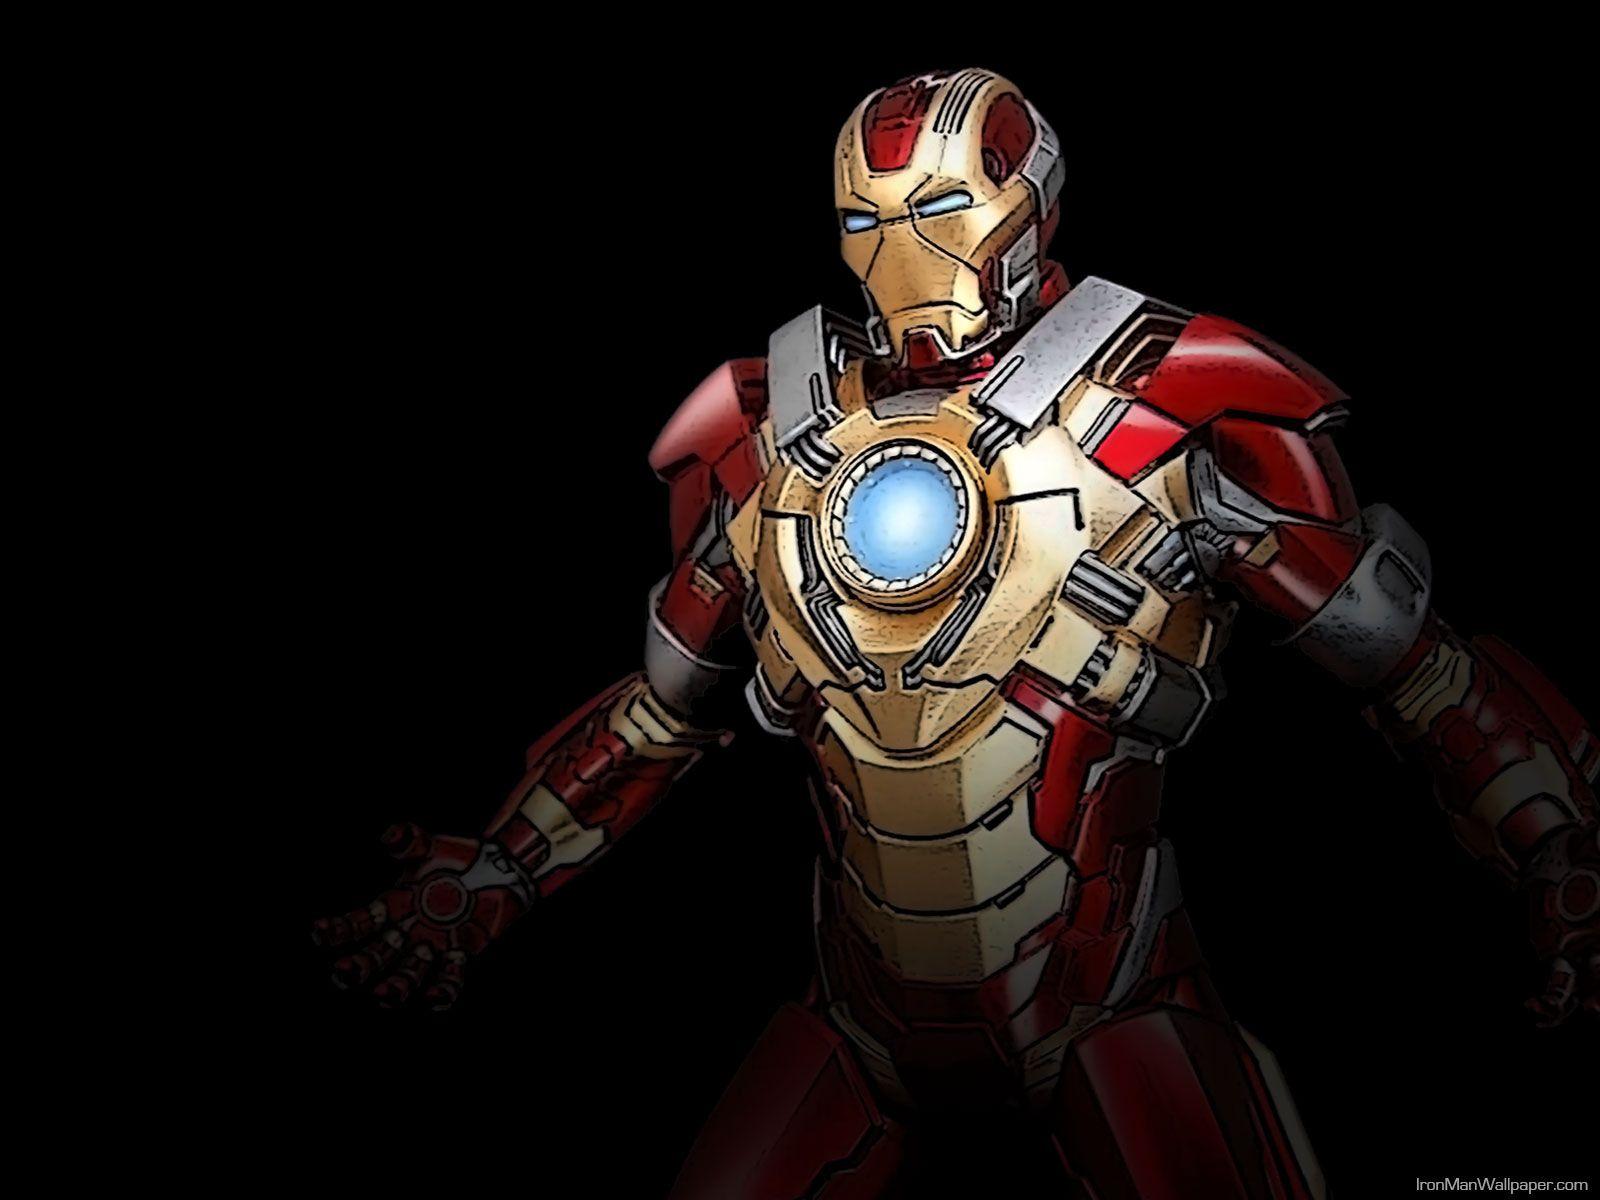 heartbreaker (mark xvii) - iron man 3 - hot toys mms212 - youtube